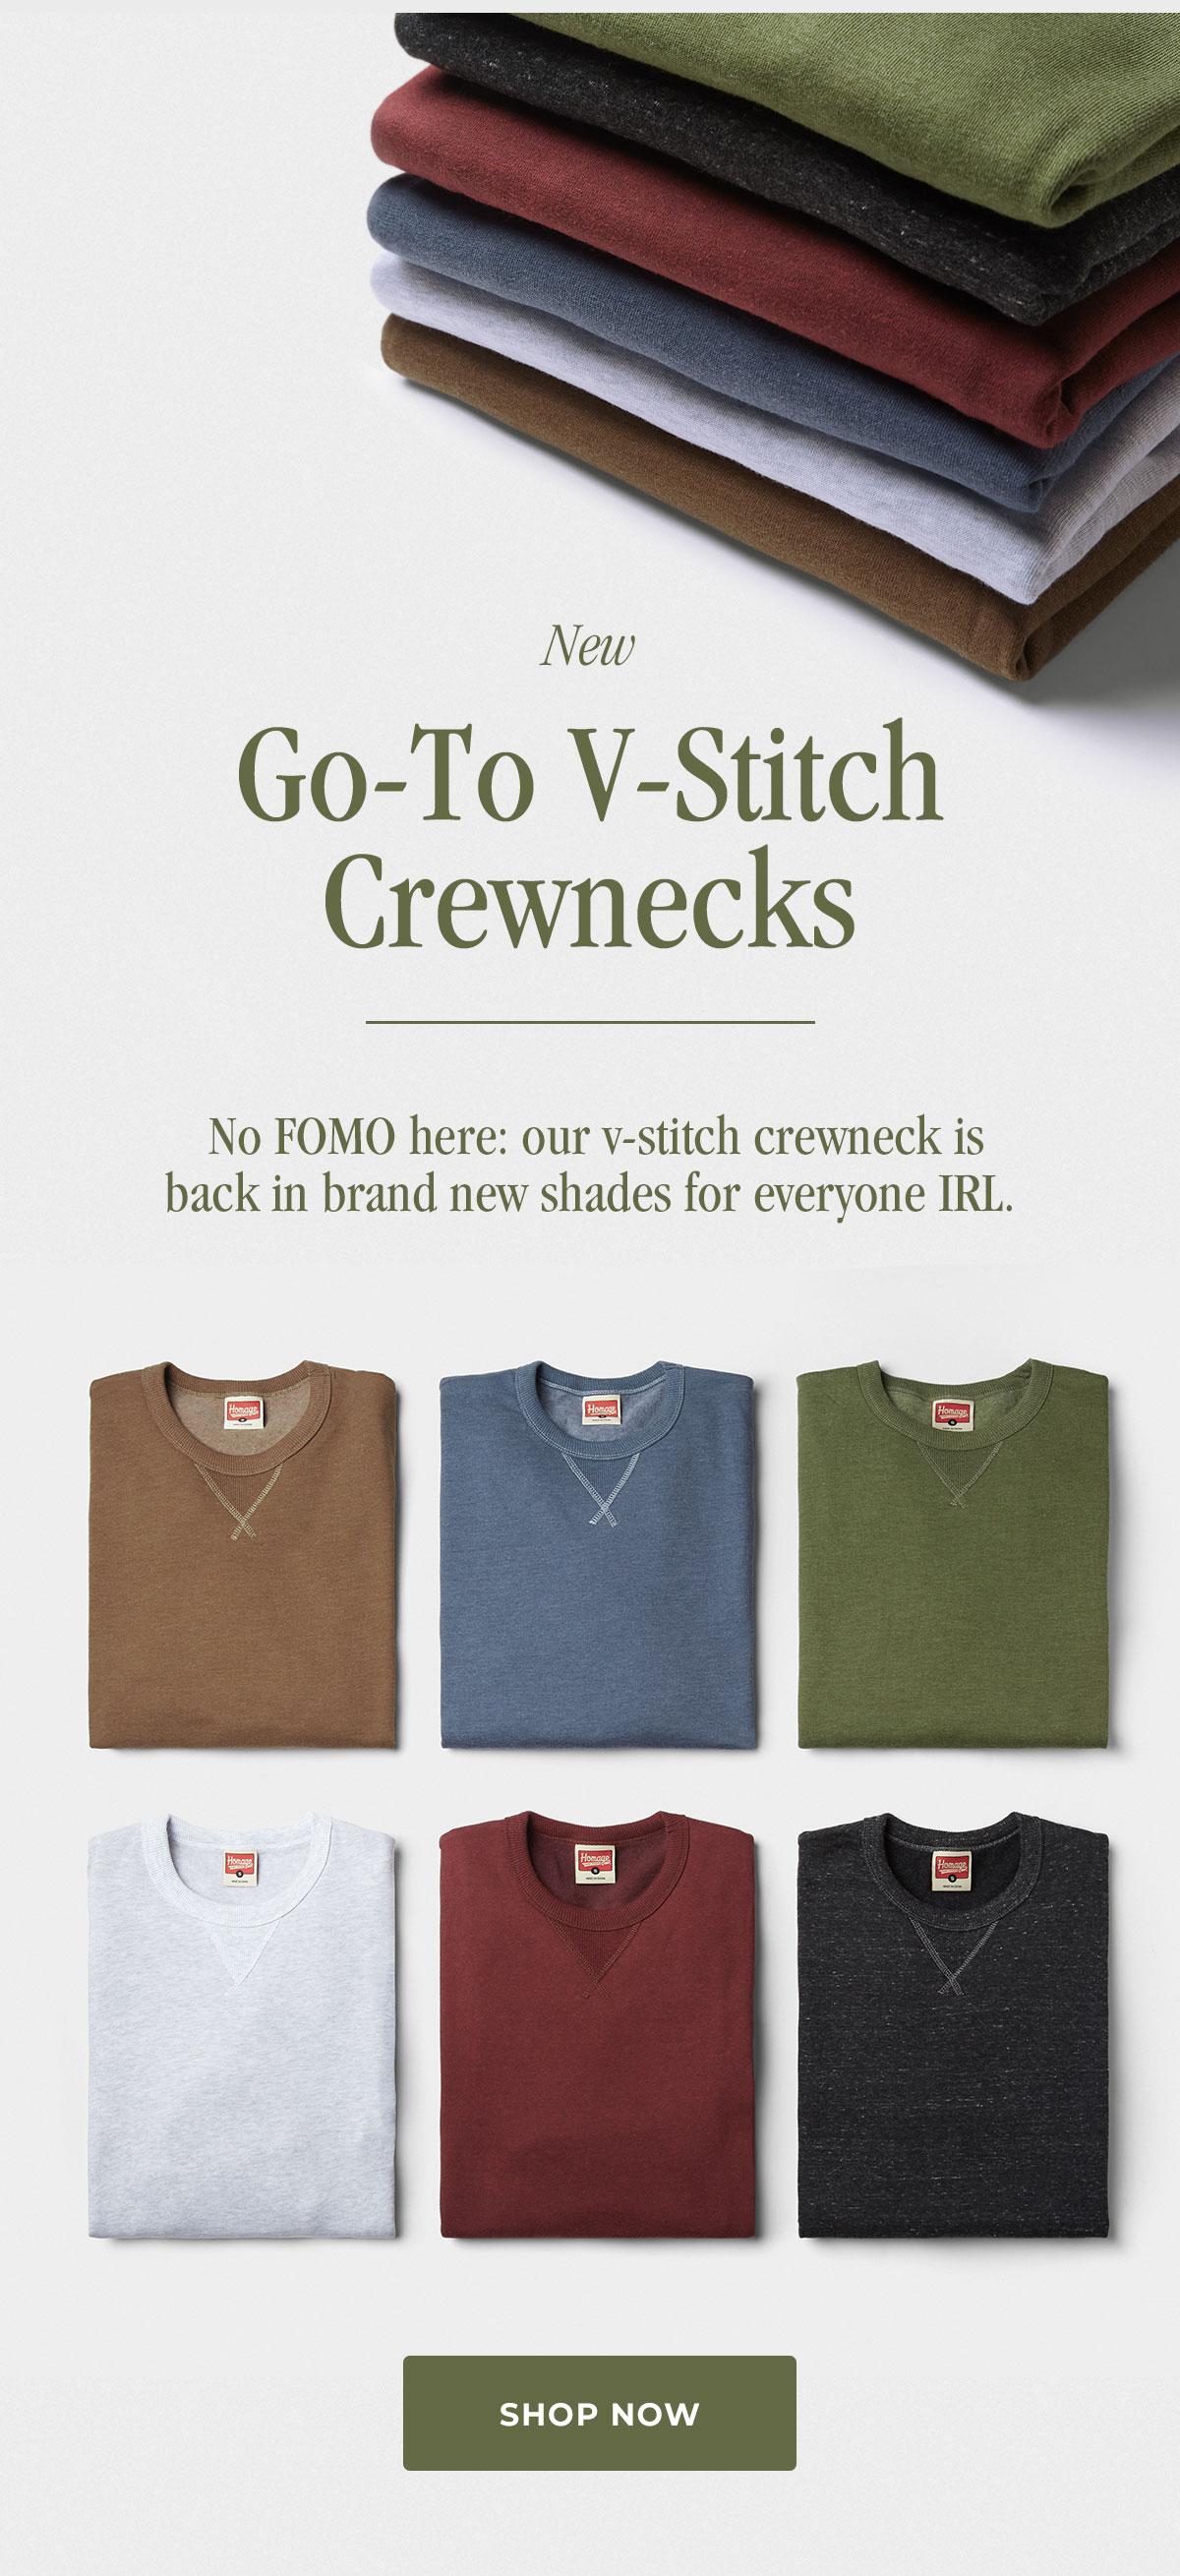 New Go-To V-Stitch Crewnecks. No FOMO here: our v-stitch crewneck is back in brand new shades for everyone IRL.